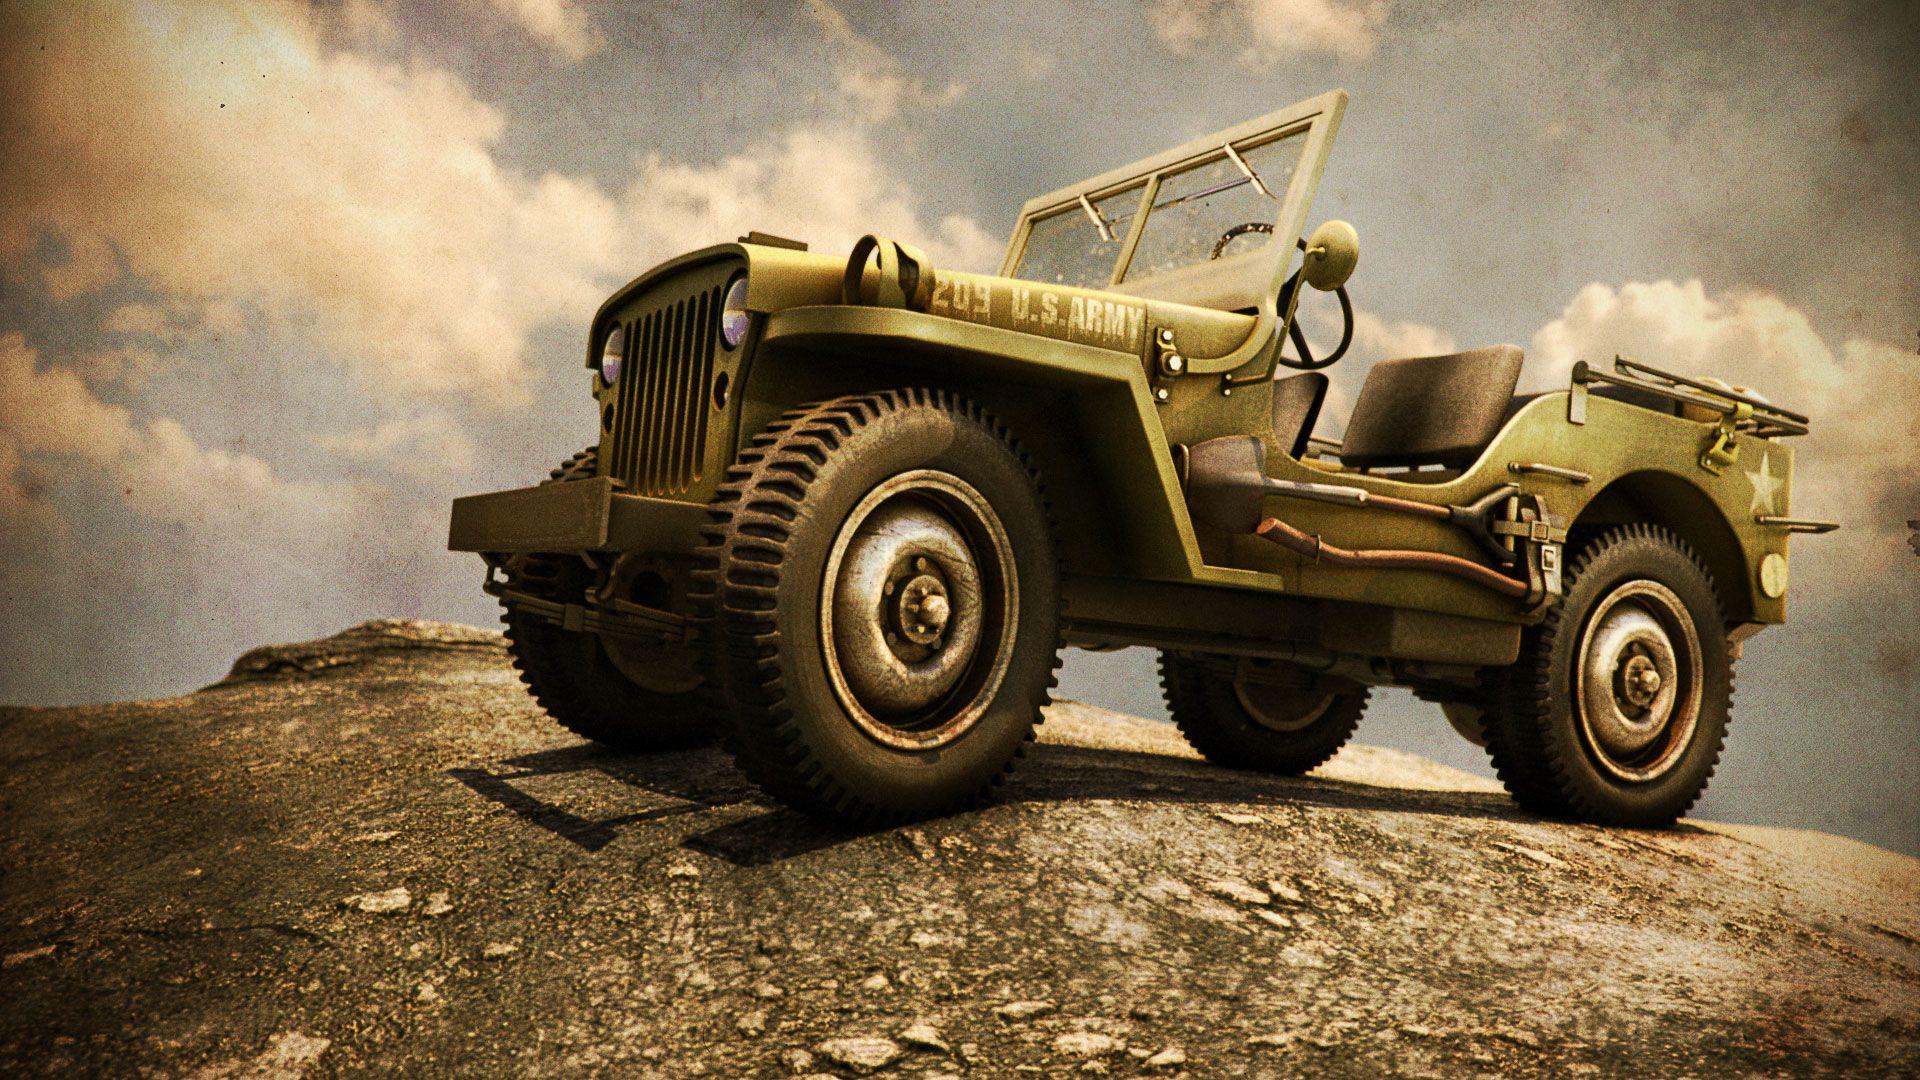 Mb Rendered2 Jpg 1920 1080 Jeep Wallpaper Willys Jeep Jeep